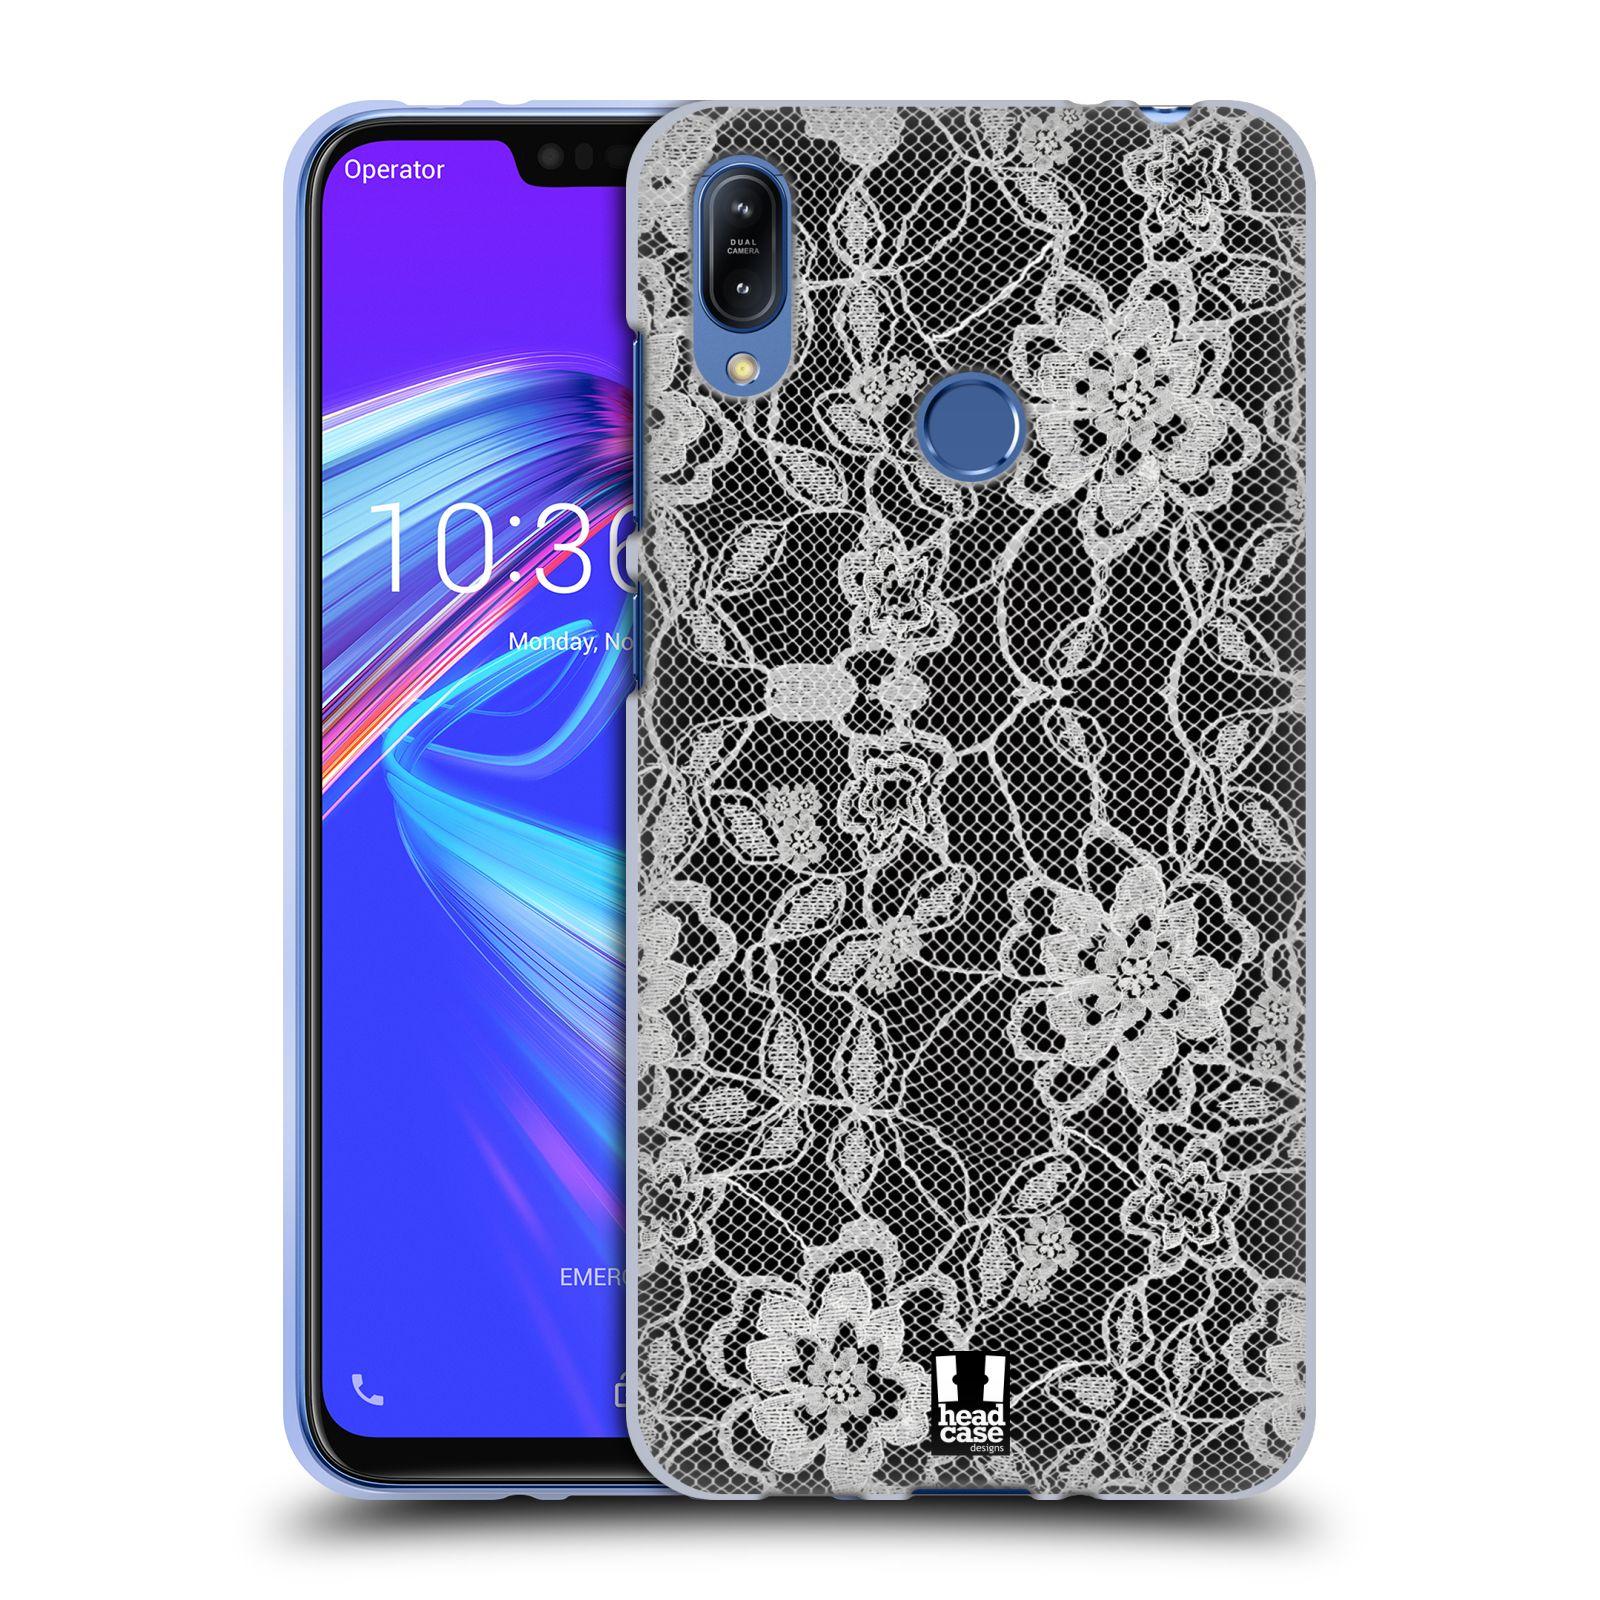 Silikonové pouzdro na mobil Asus Zenfone Max (M2) ZB633KL - Head Case - FLOWERY KRAJKA